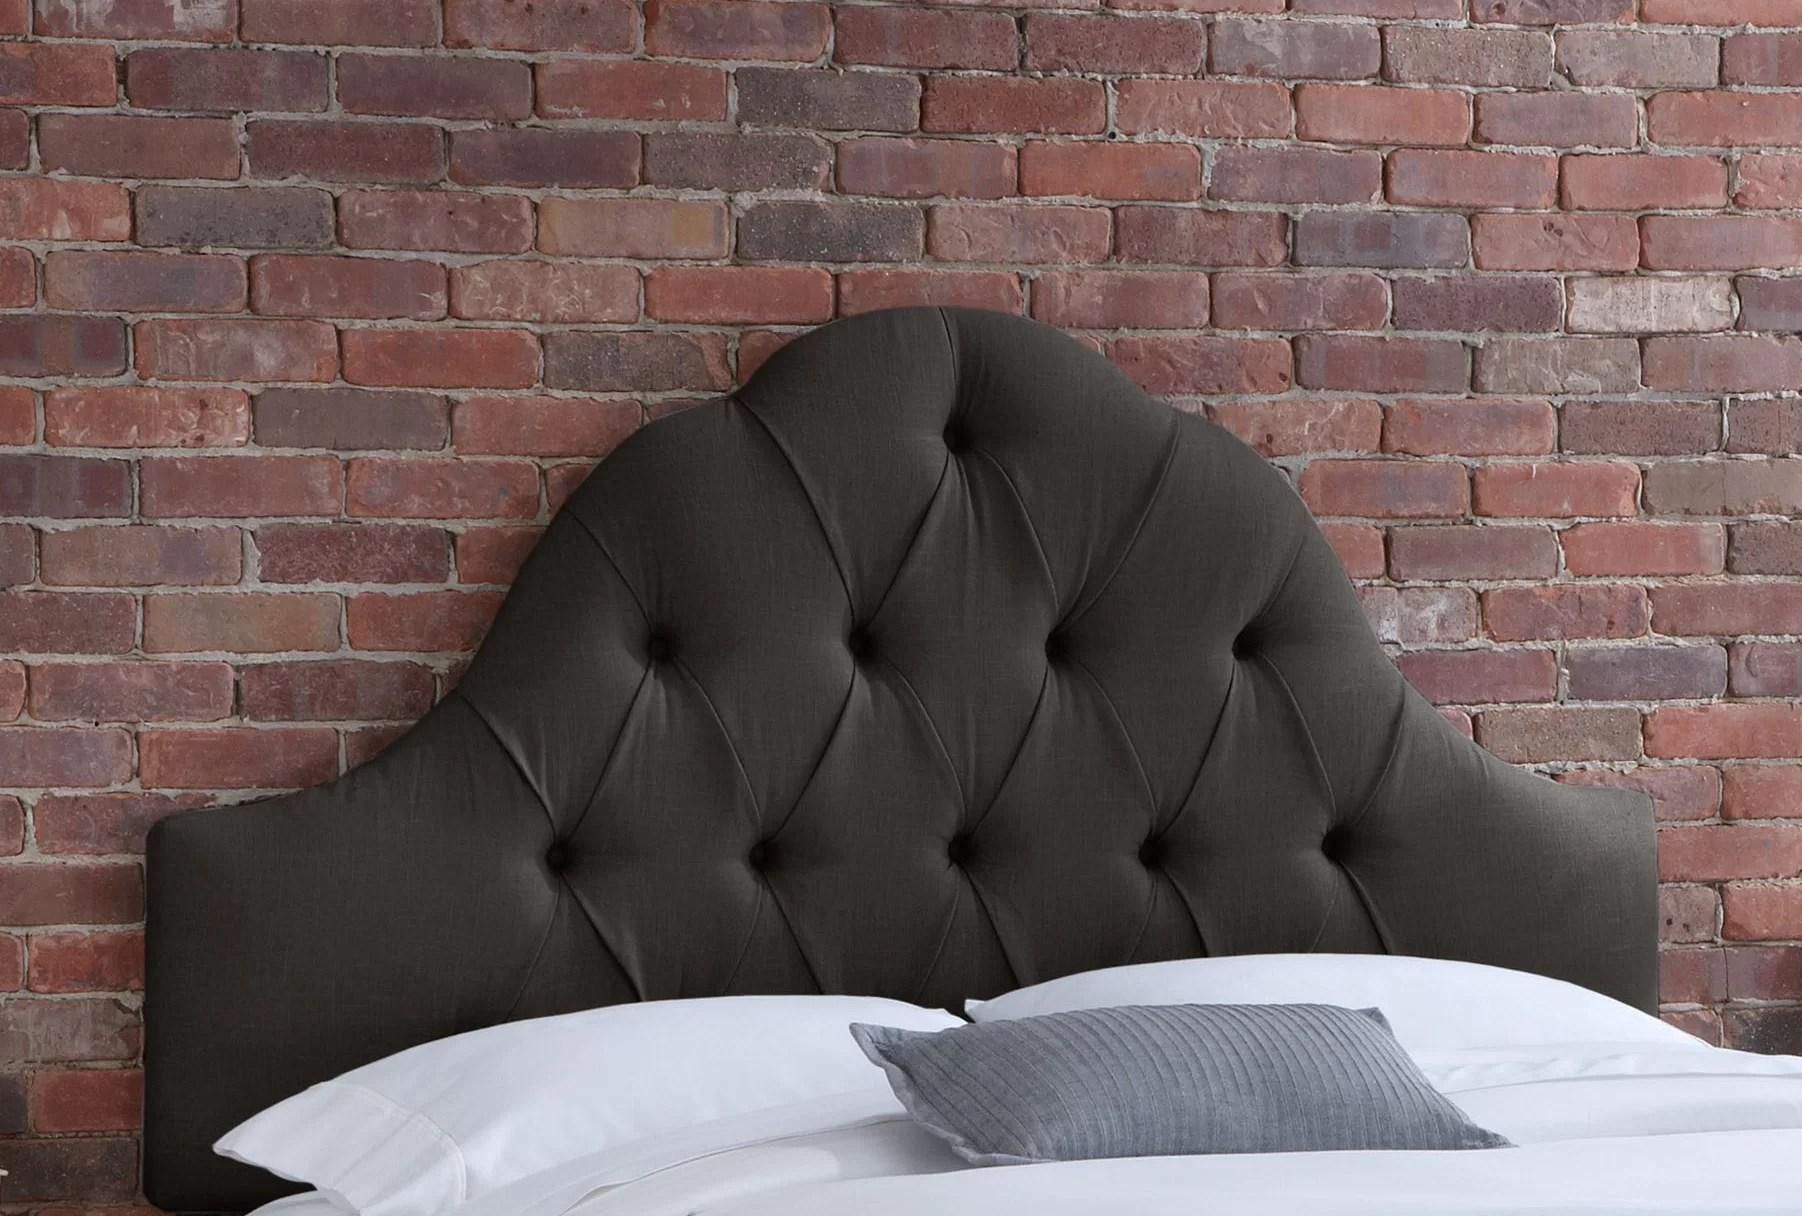 Skyline Furniture Tufted Upholstered Panel Headboard